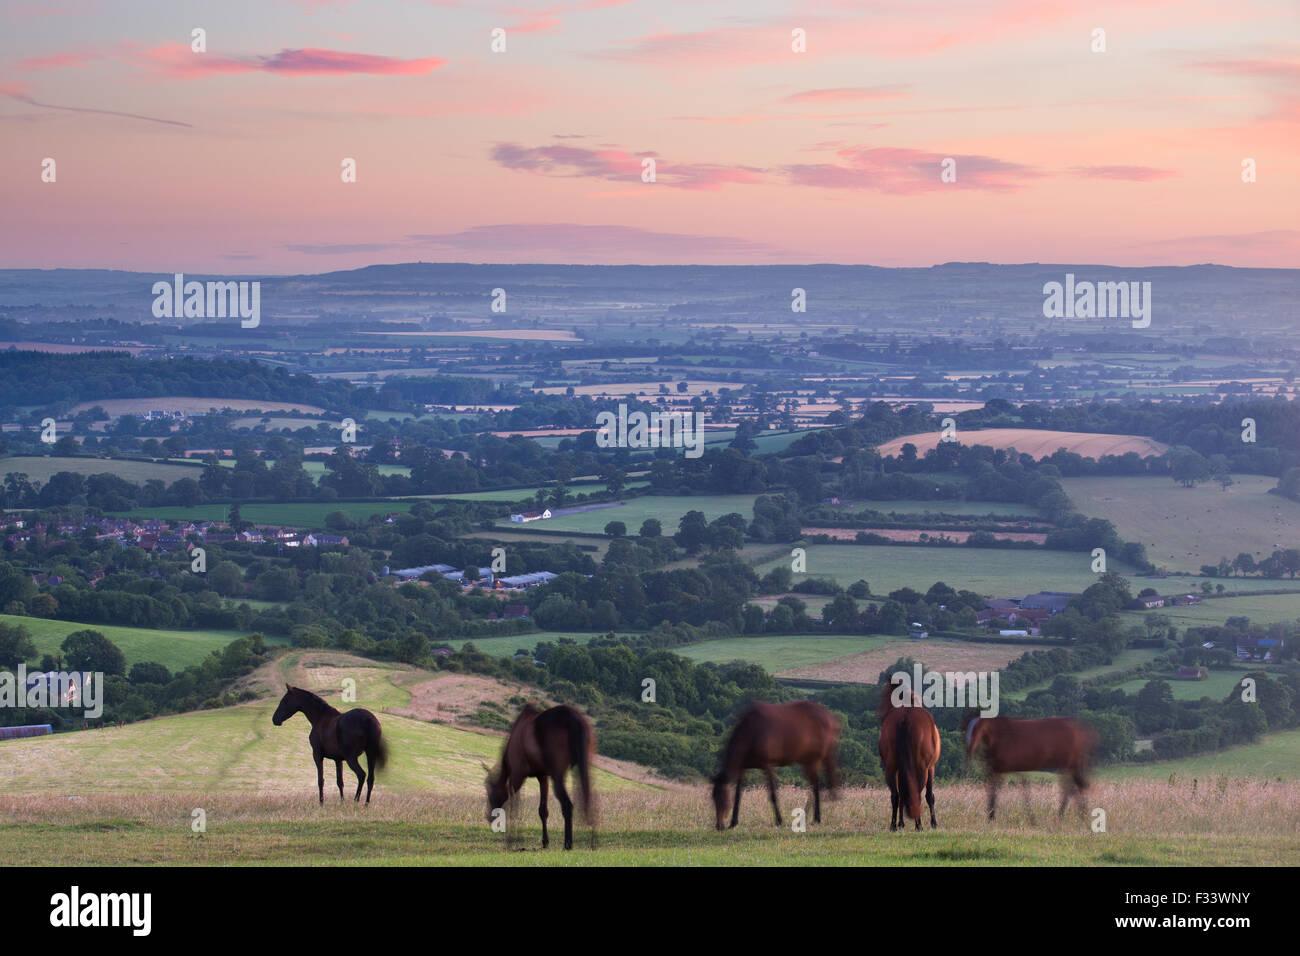 horses on Bulbarrow Hill at dawn, Dorset, England, UK - Stock Image